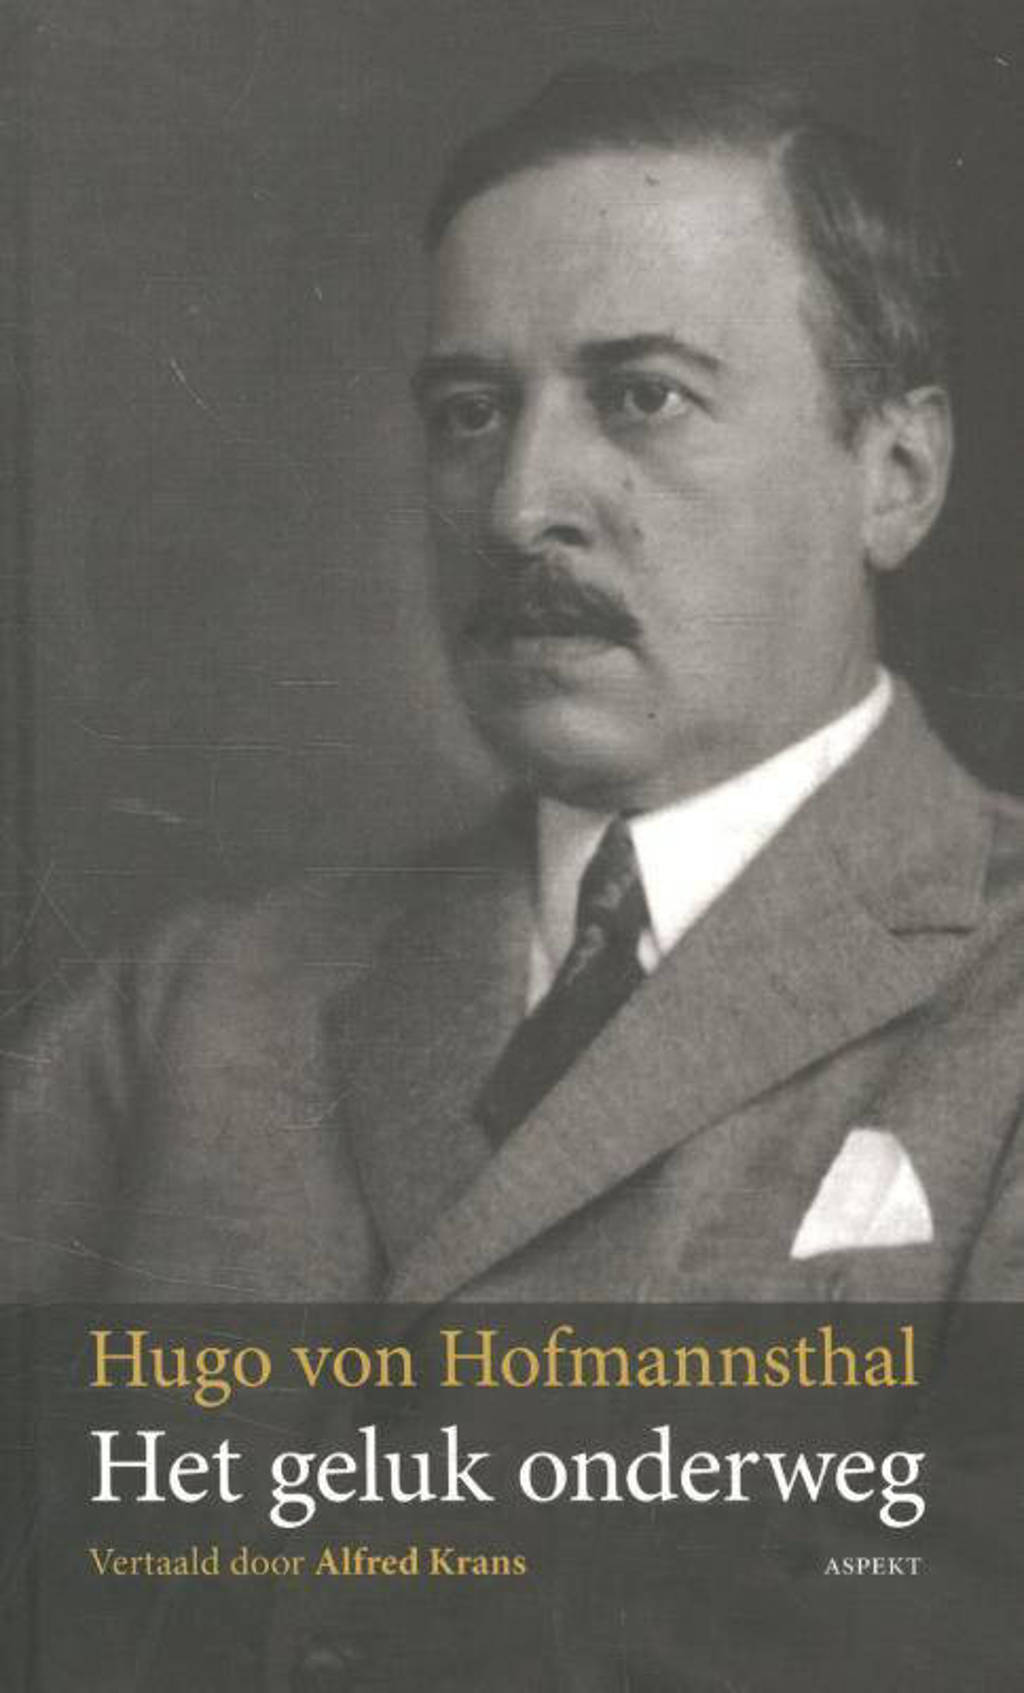 Het geluk onderweg - Hugo von Hofmannsthal